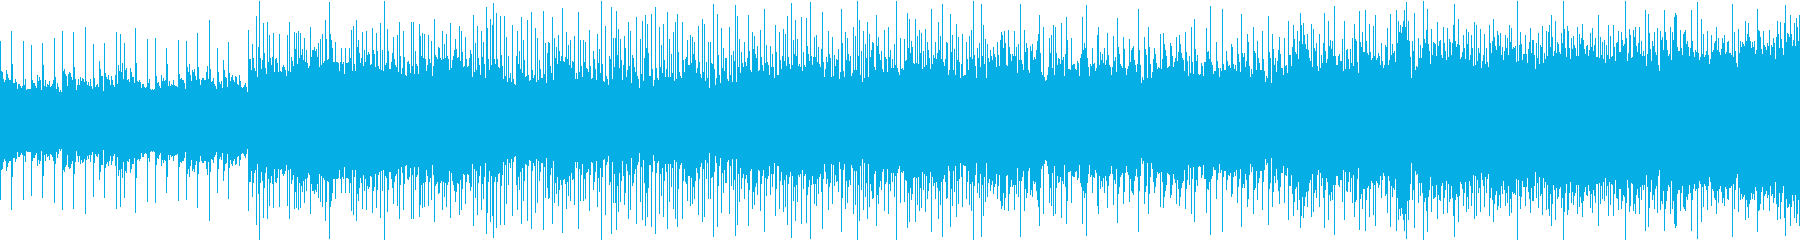 RPG風バトルBGMの再生済みの波形